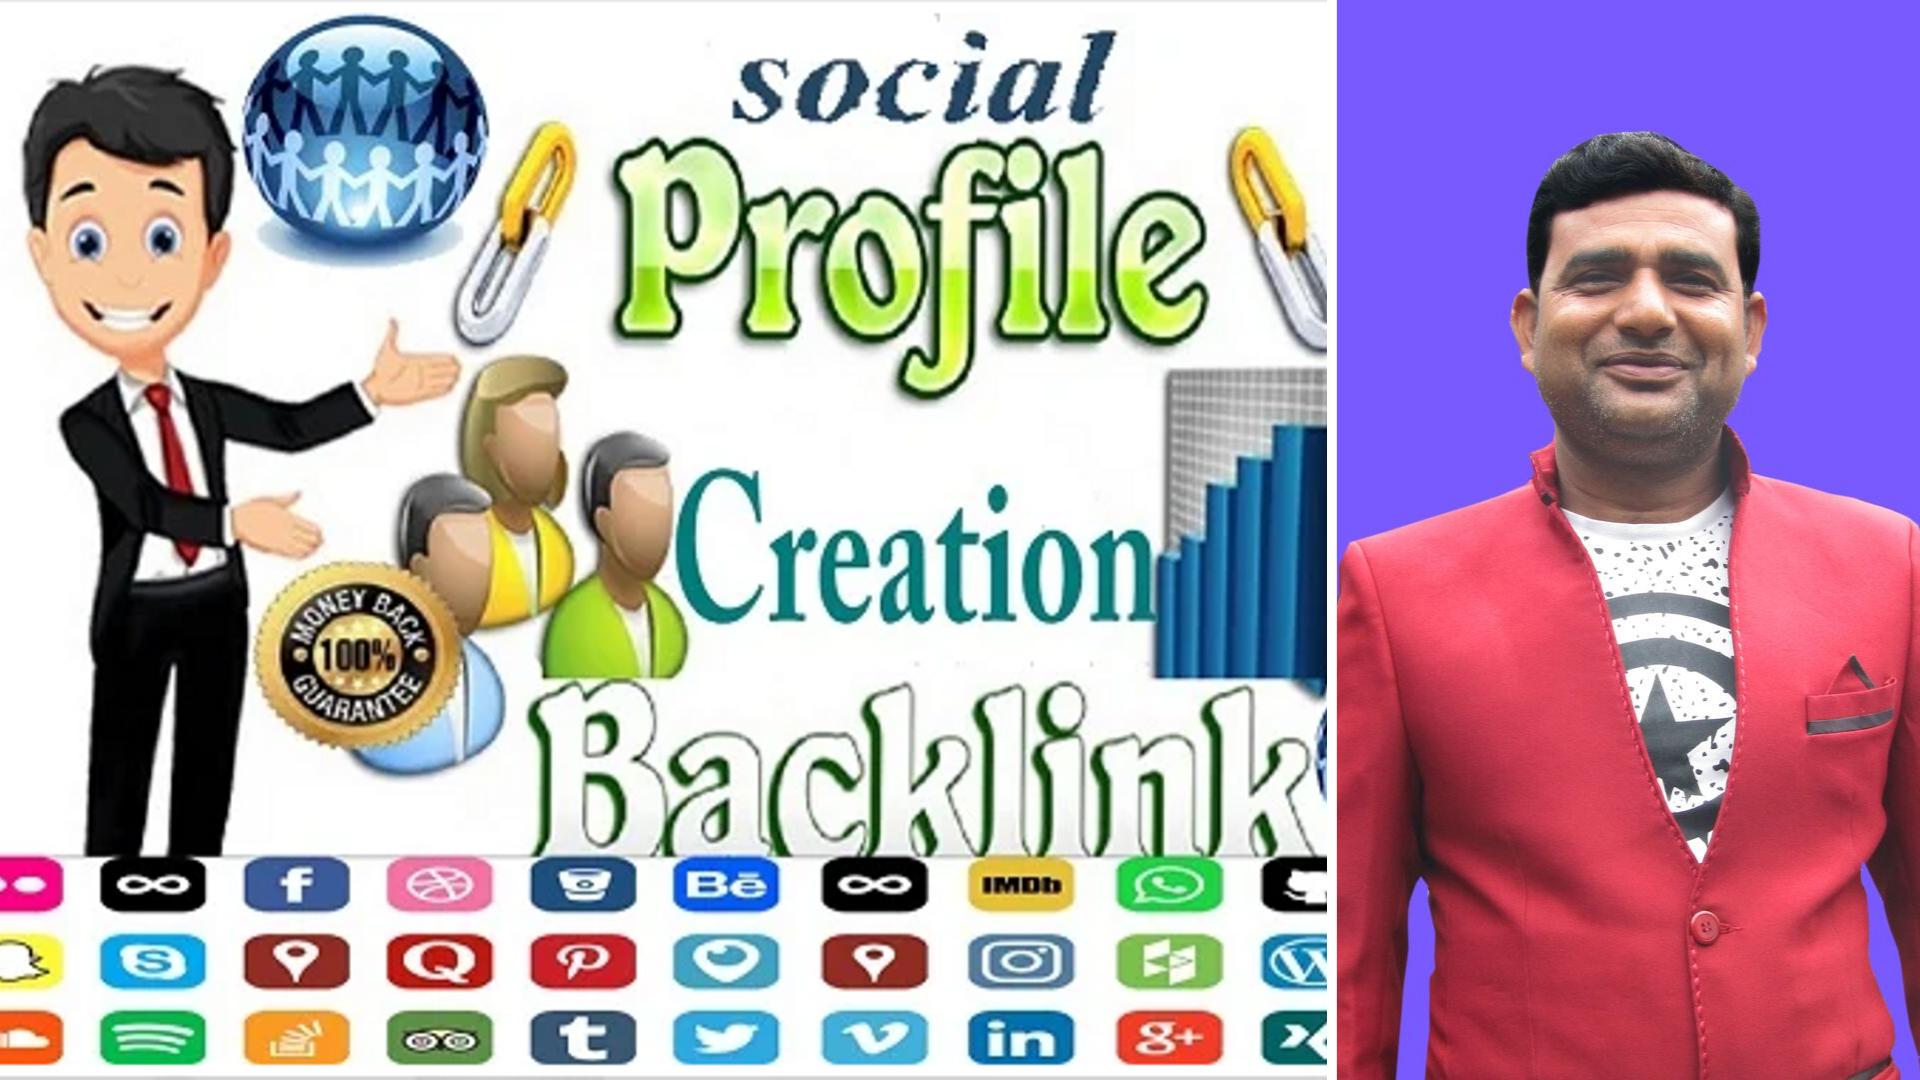 I Do 40 Quality profile creation Dofollow backlinks for your website with high DA